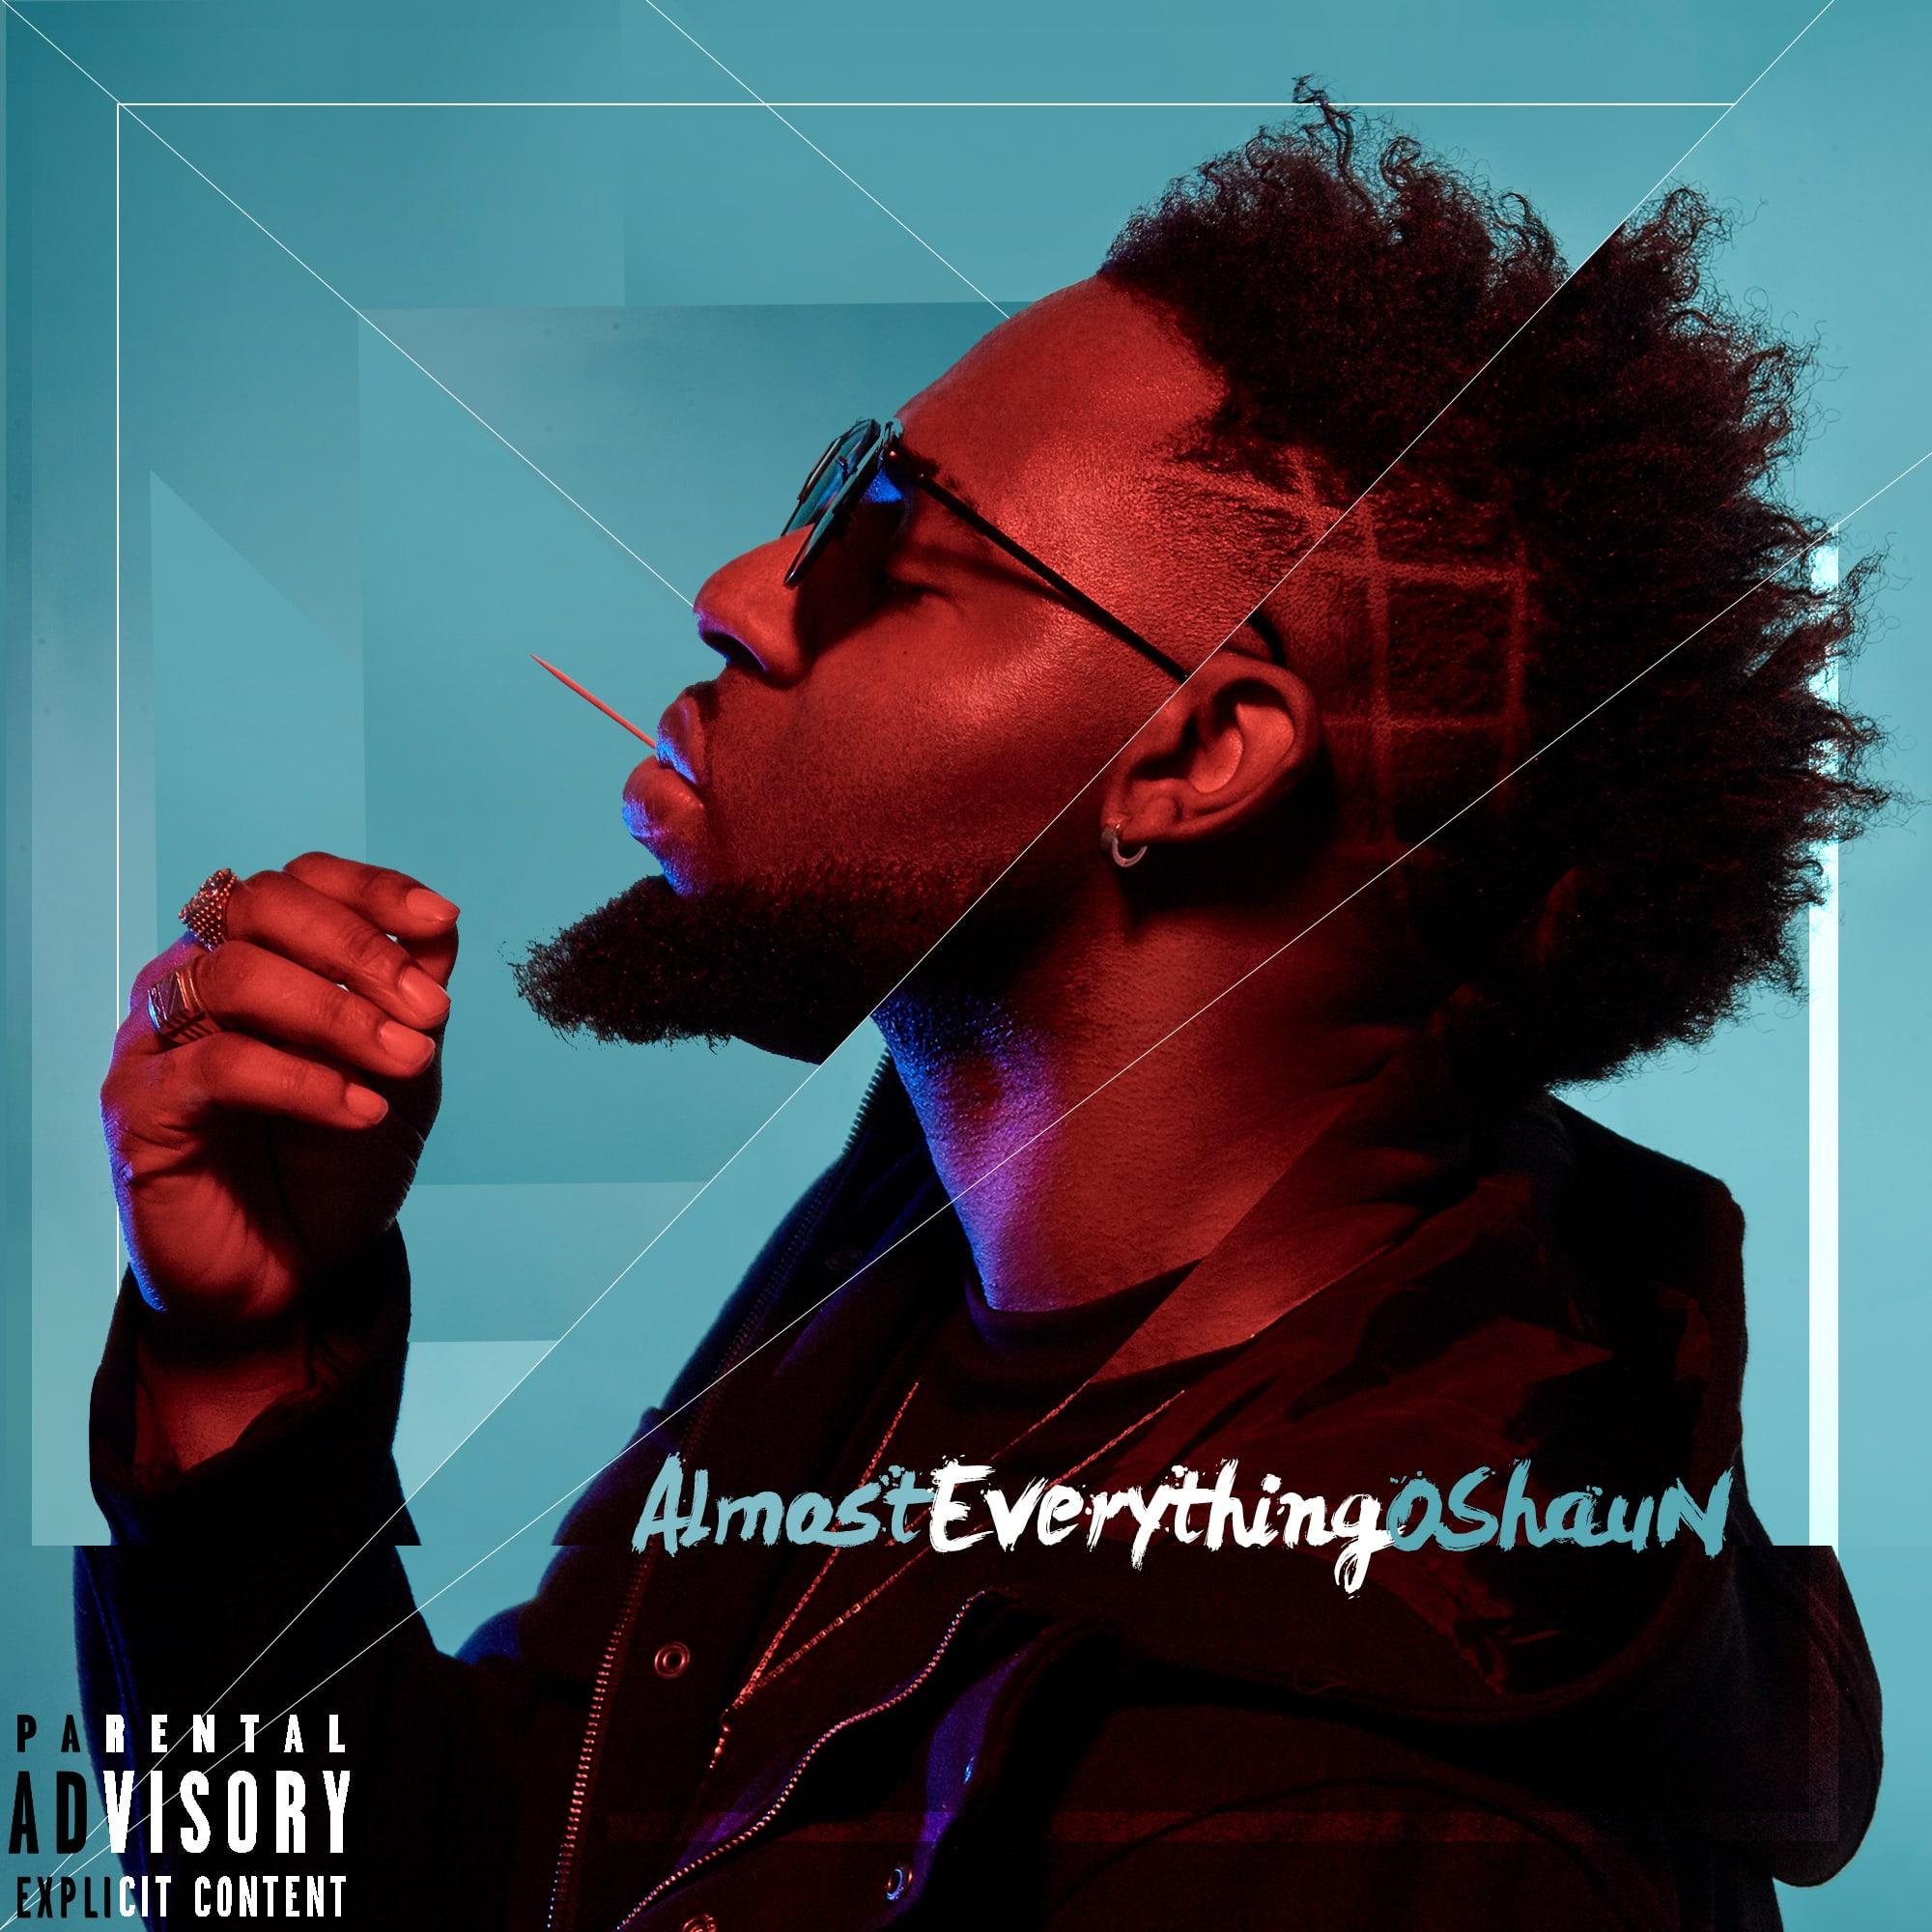 EverythingOshauN Almost Everything EP Cover Art